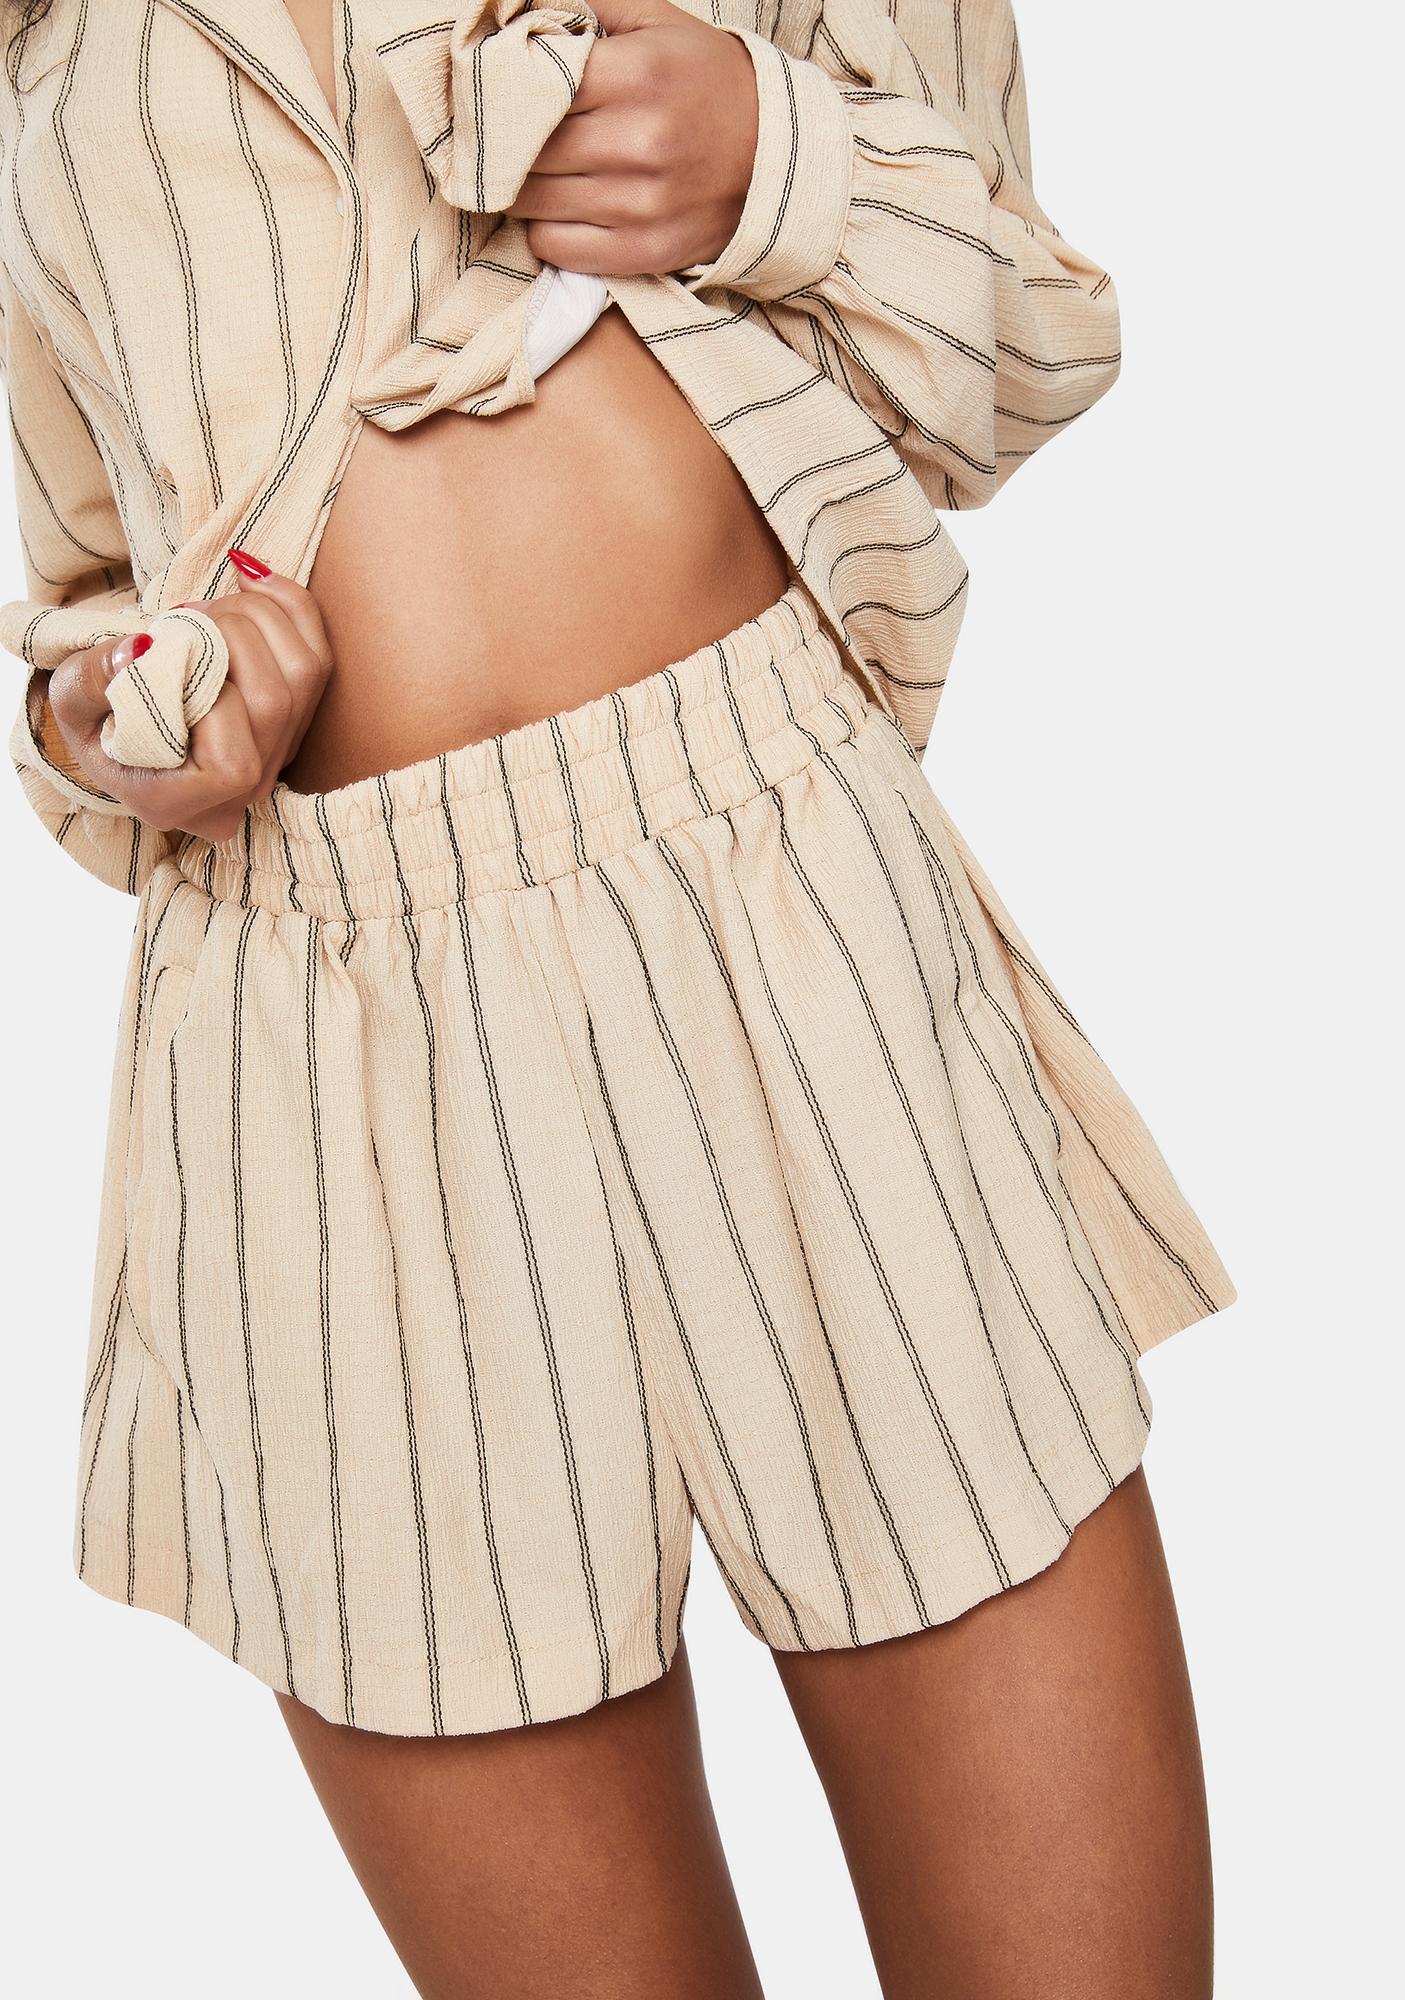 Dippin' Daisy's Tan Stripe Carefree Lounge Shorts